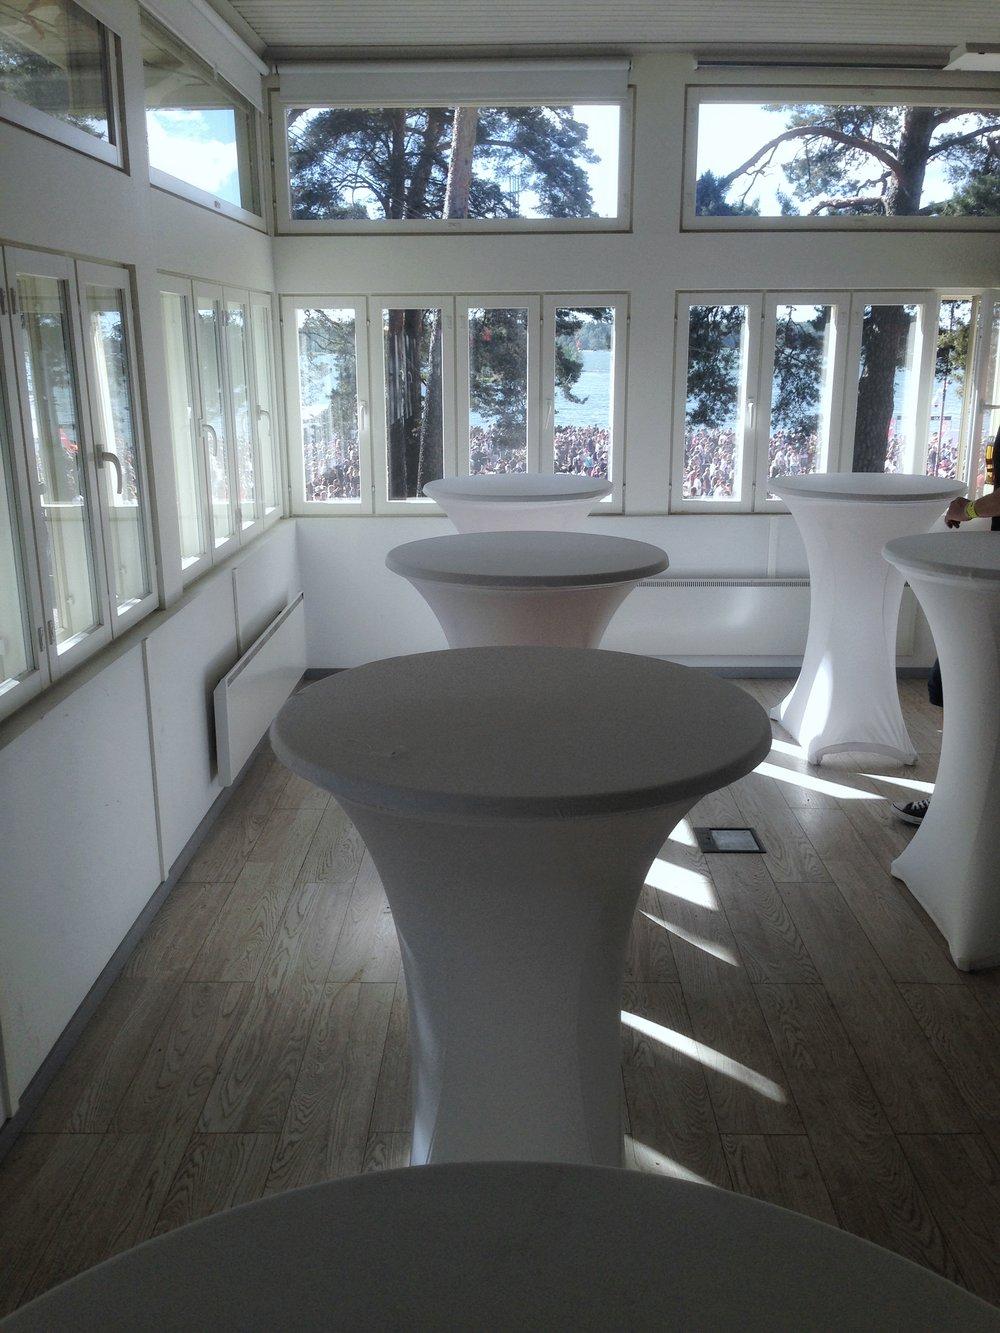 Ateljé-sali (cocktail-pöydät asiakkaan) © Ville Ylönen